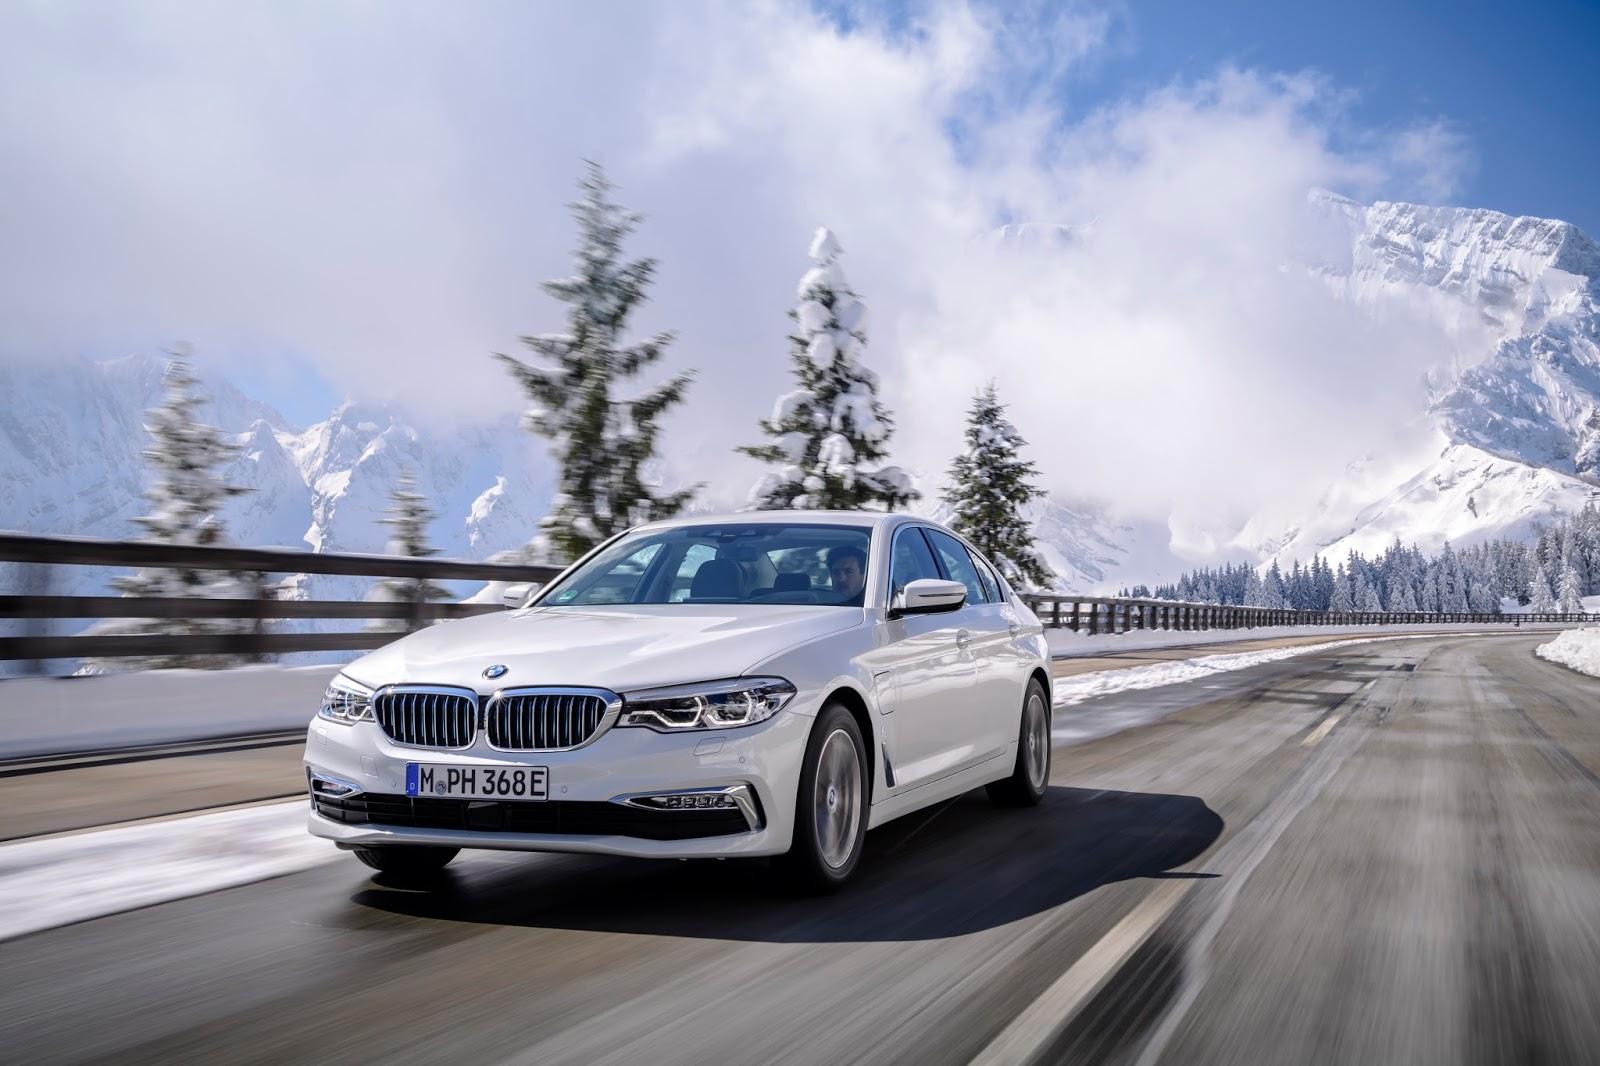 P90256335 highRes the new bmw 530e ipe Η BMW 530e iPerformance φέρνει την ηλεκτρική επανάσταση BMW, BMW 5, BMW 530e iPerformance, Electric cars, Hybrid, Λανσάρισμα